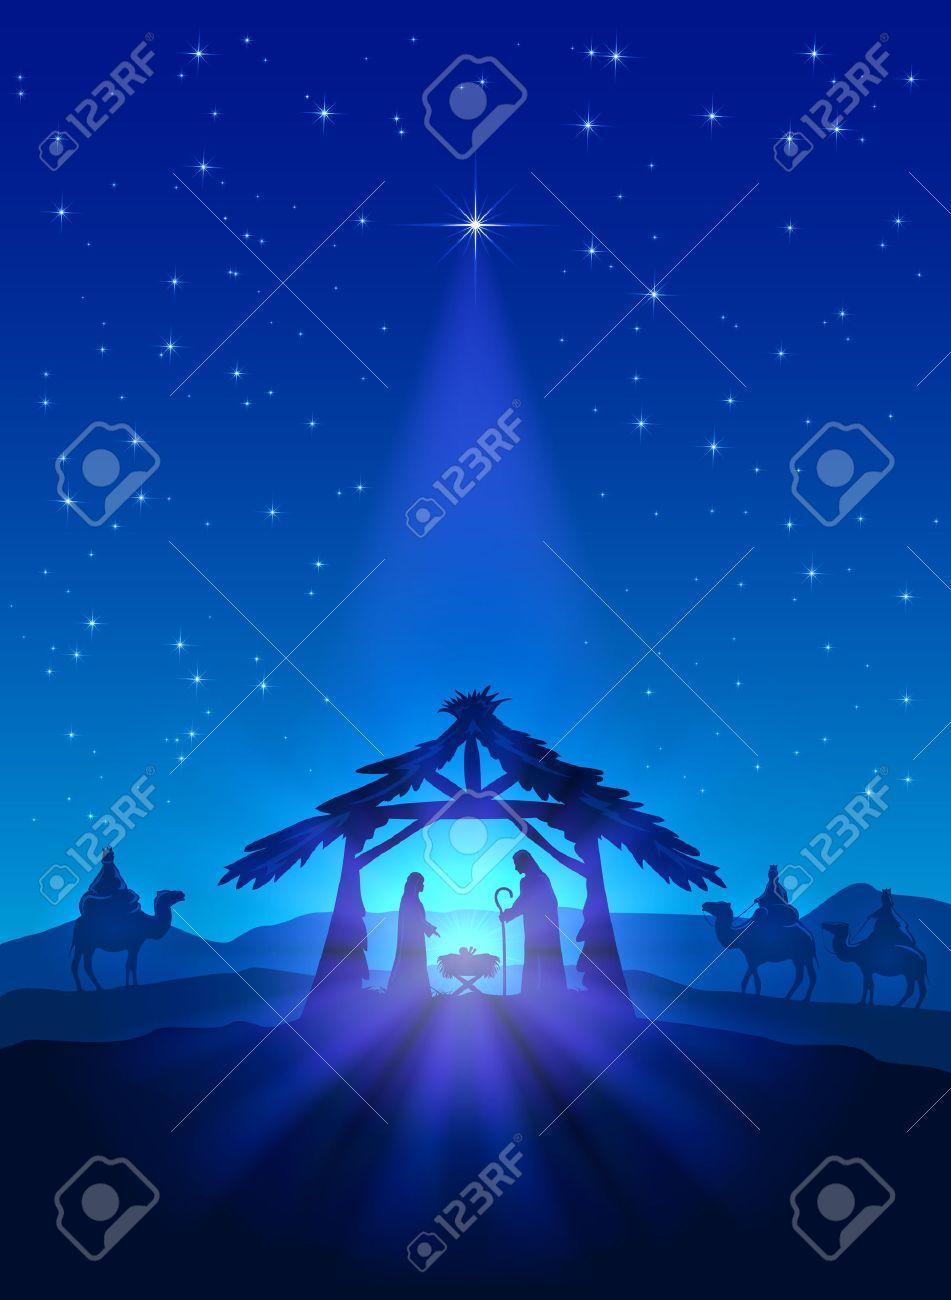 Christian theme, Christmas star on blue sky and birth of Jesus, illustration. - 48793099